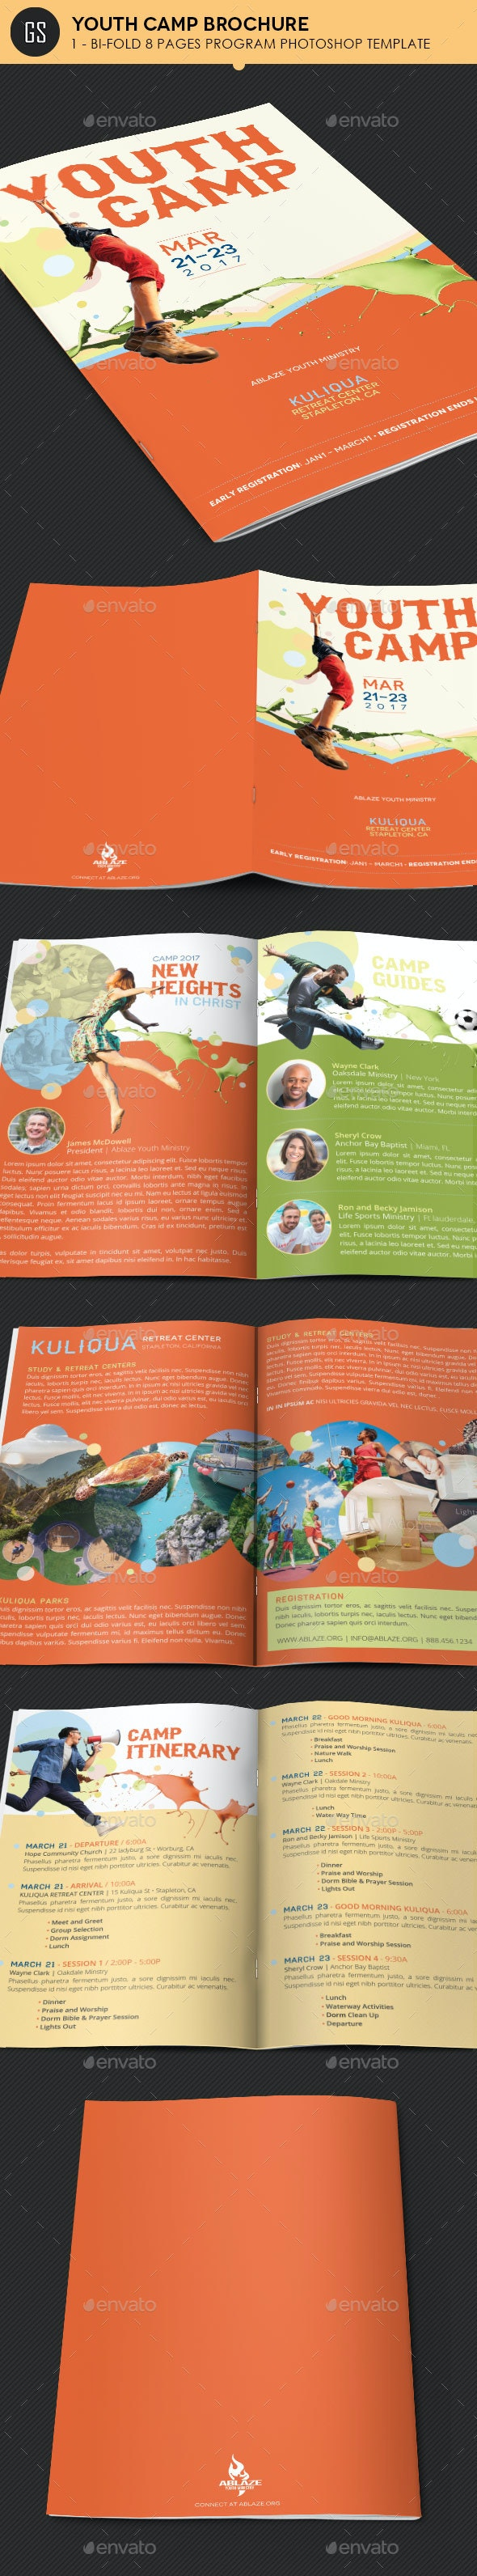 Youth Camp Bi-Fold Brochure Template